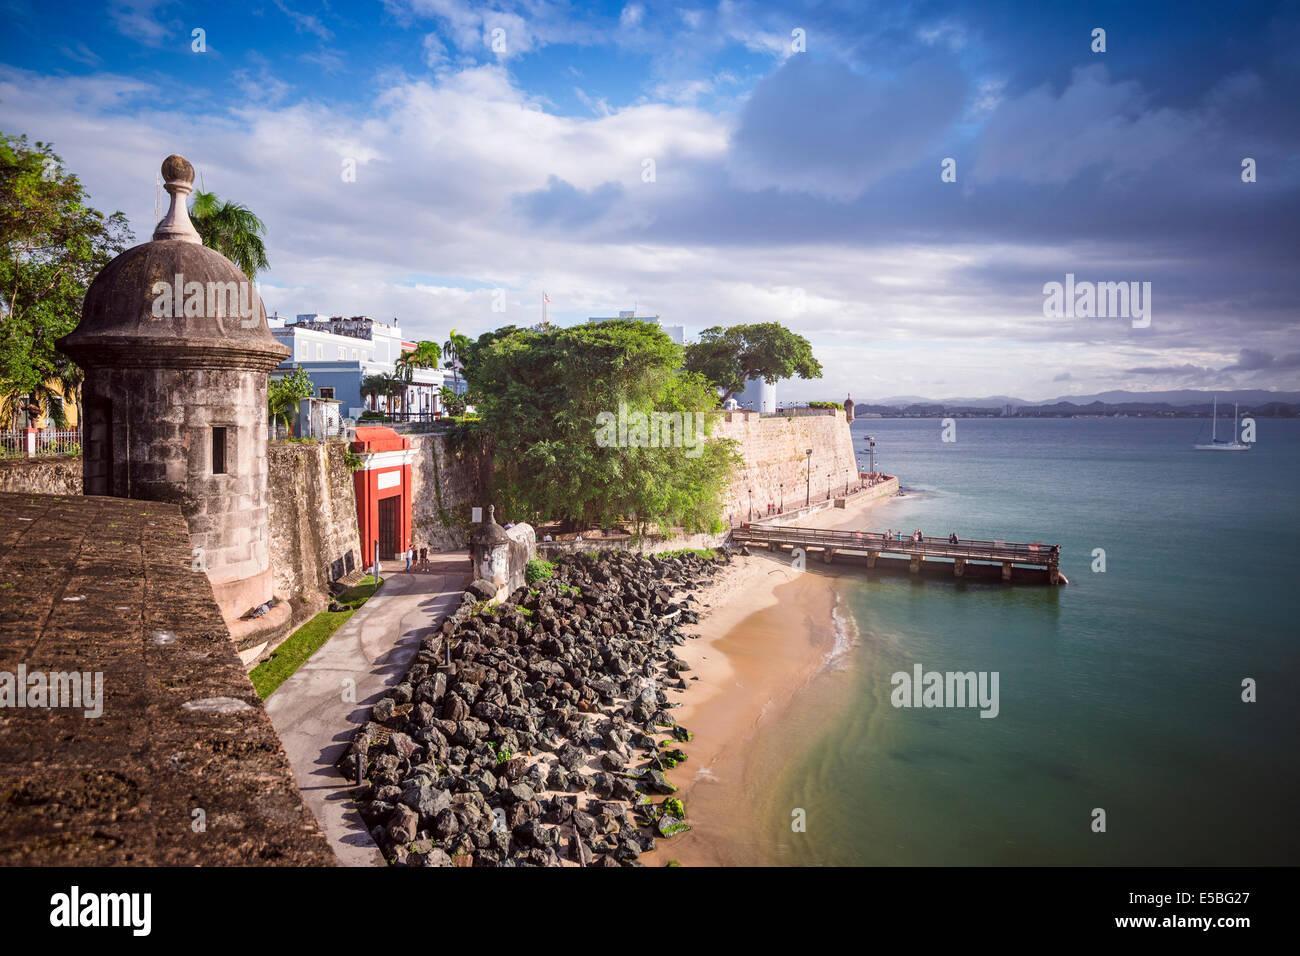 San Juan, Puerto Rico coast. - Stock Image